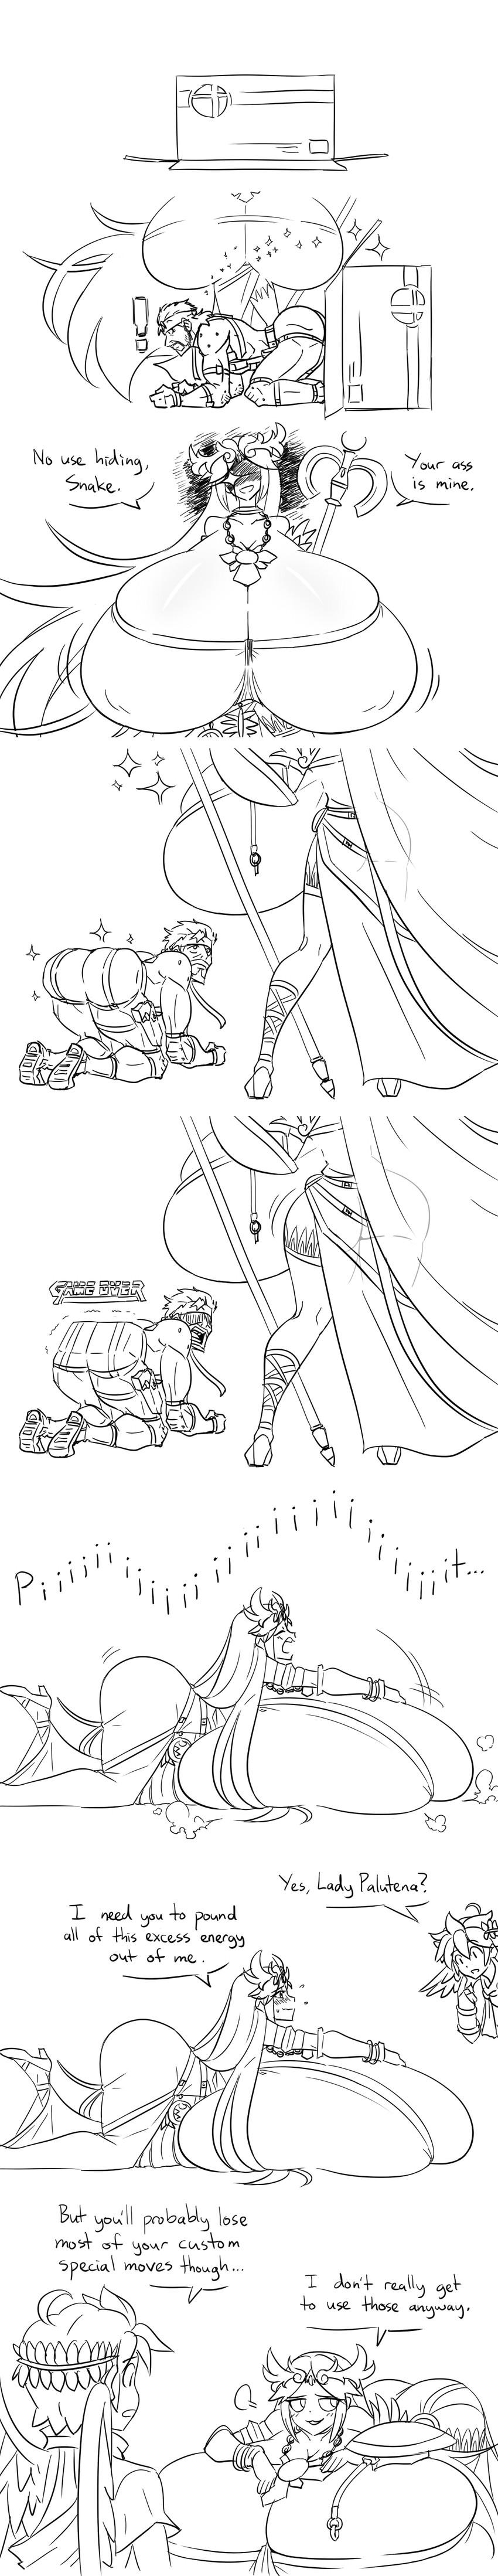 palutena, pit, and solid snake (super smash bros. ultimate and etc) drawn by matsu-sensei